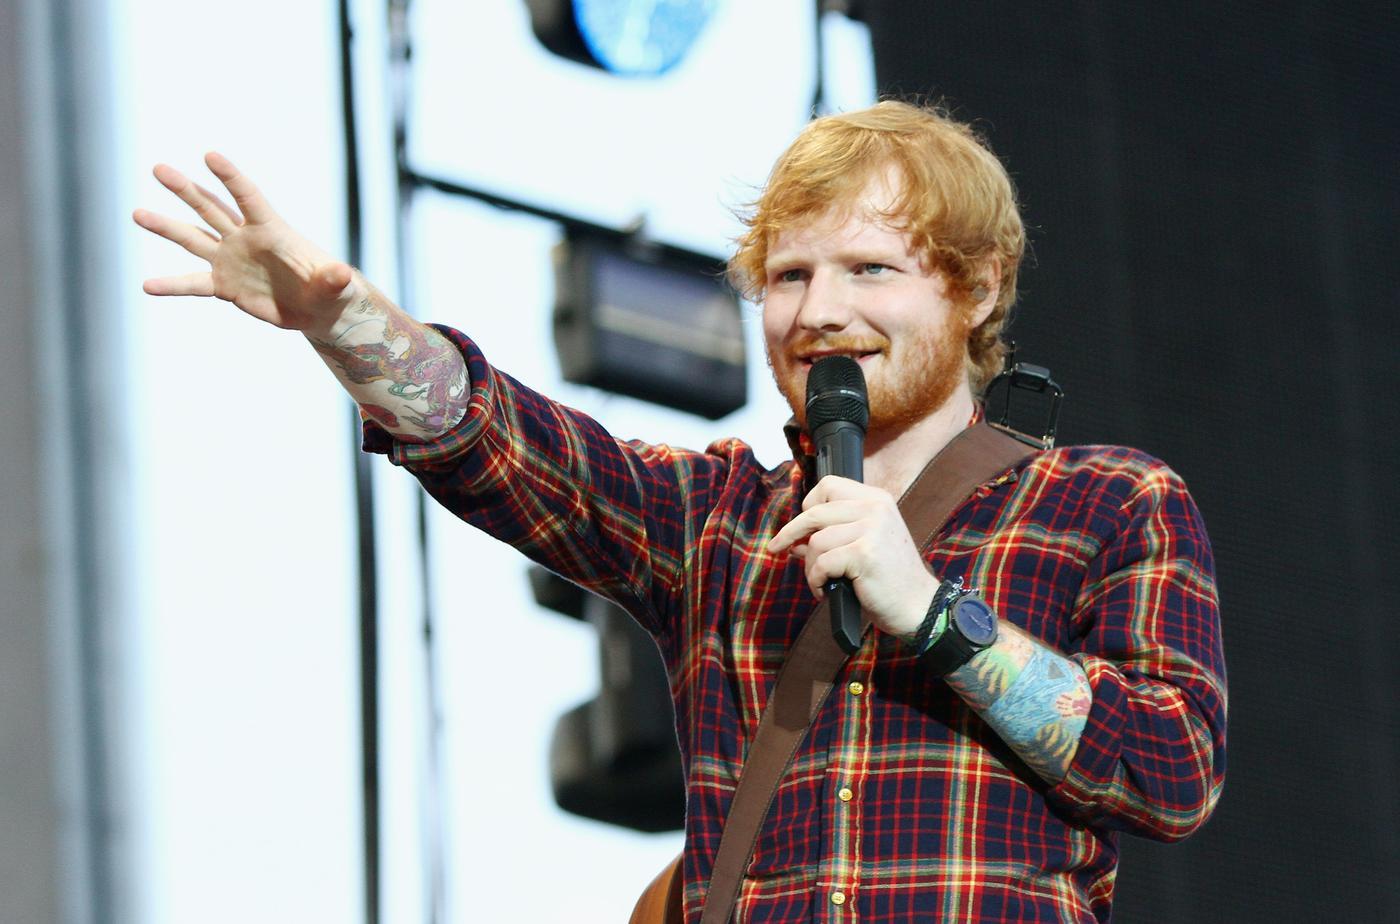 Ed Sheeran Performs At Croke Park In Dublin Phillip Massey/WireImage